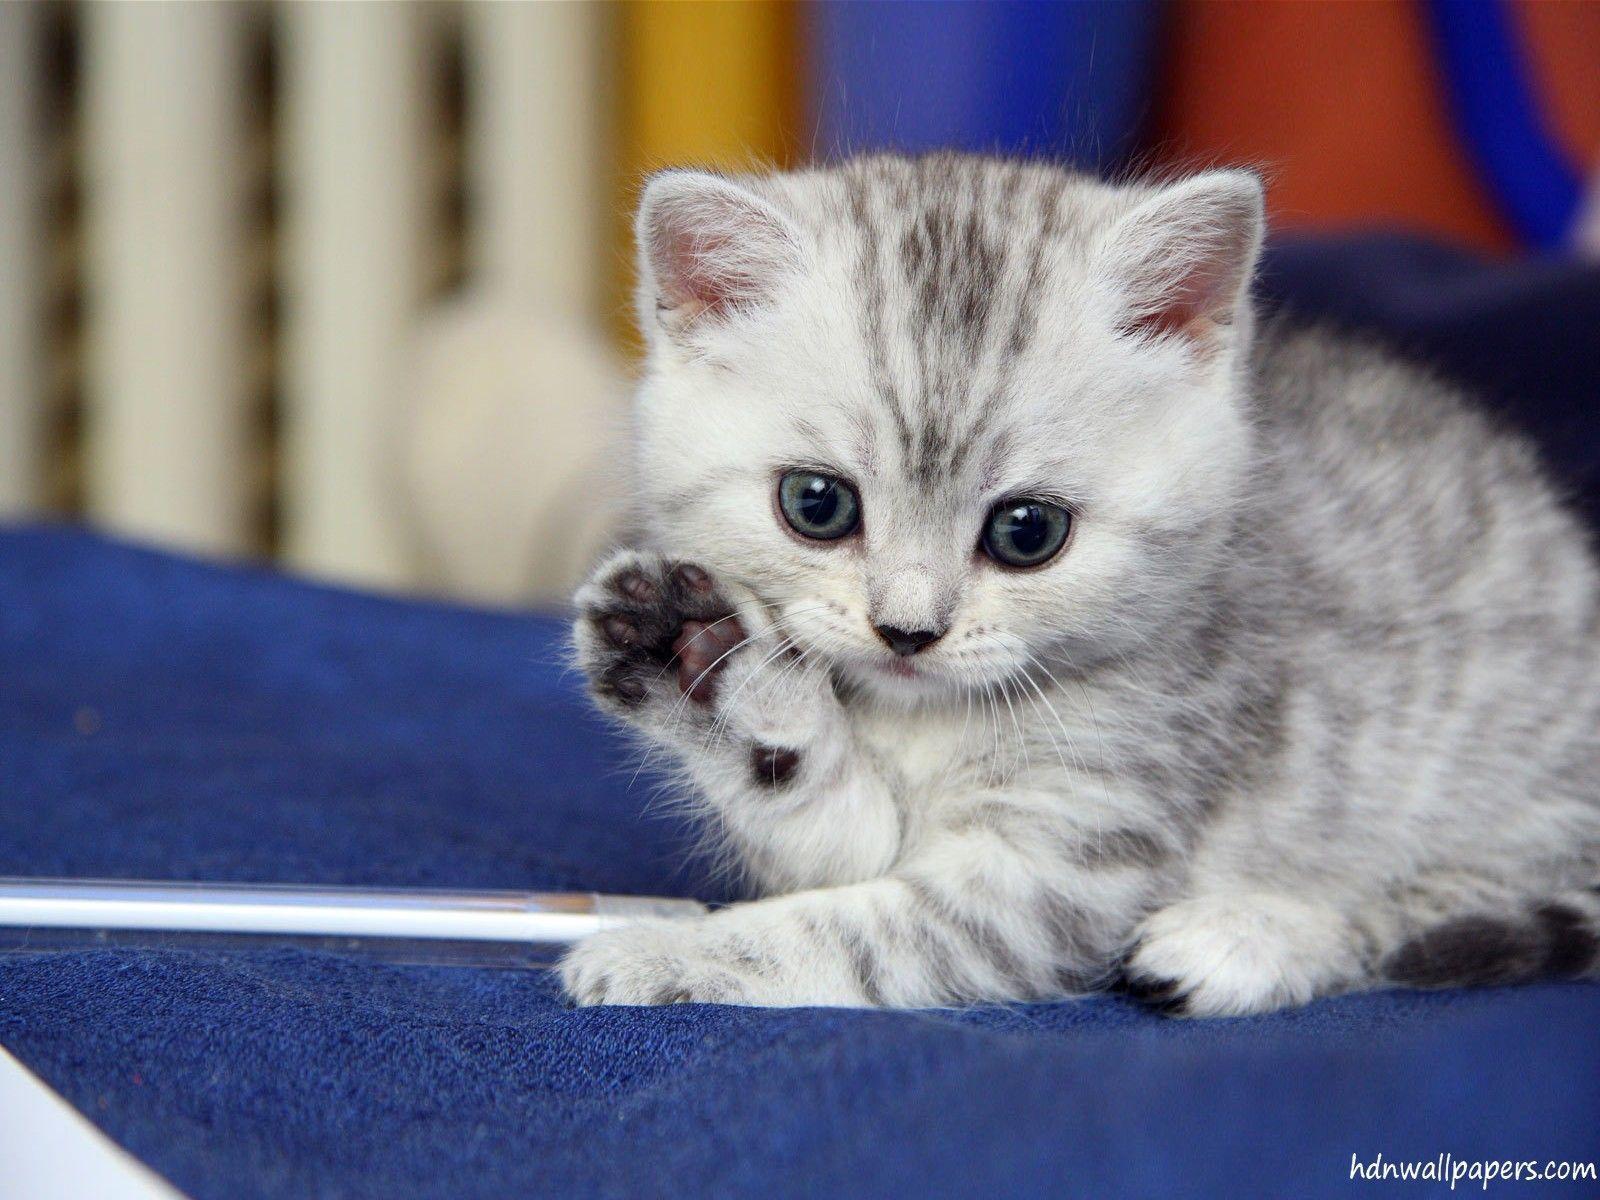 Cute Kittens Wallpapers HD Wallpapers Pinterest